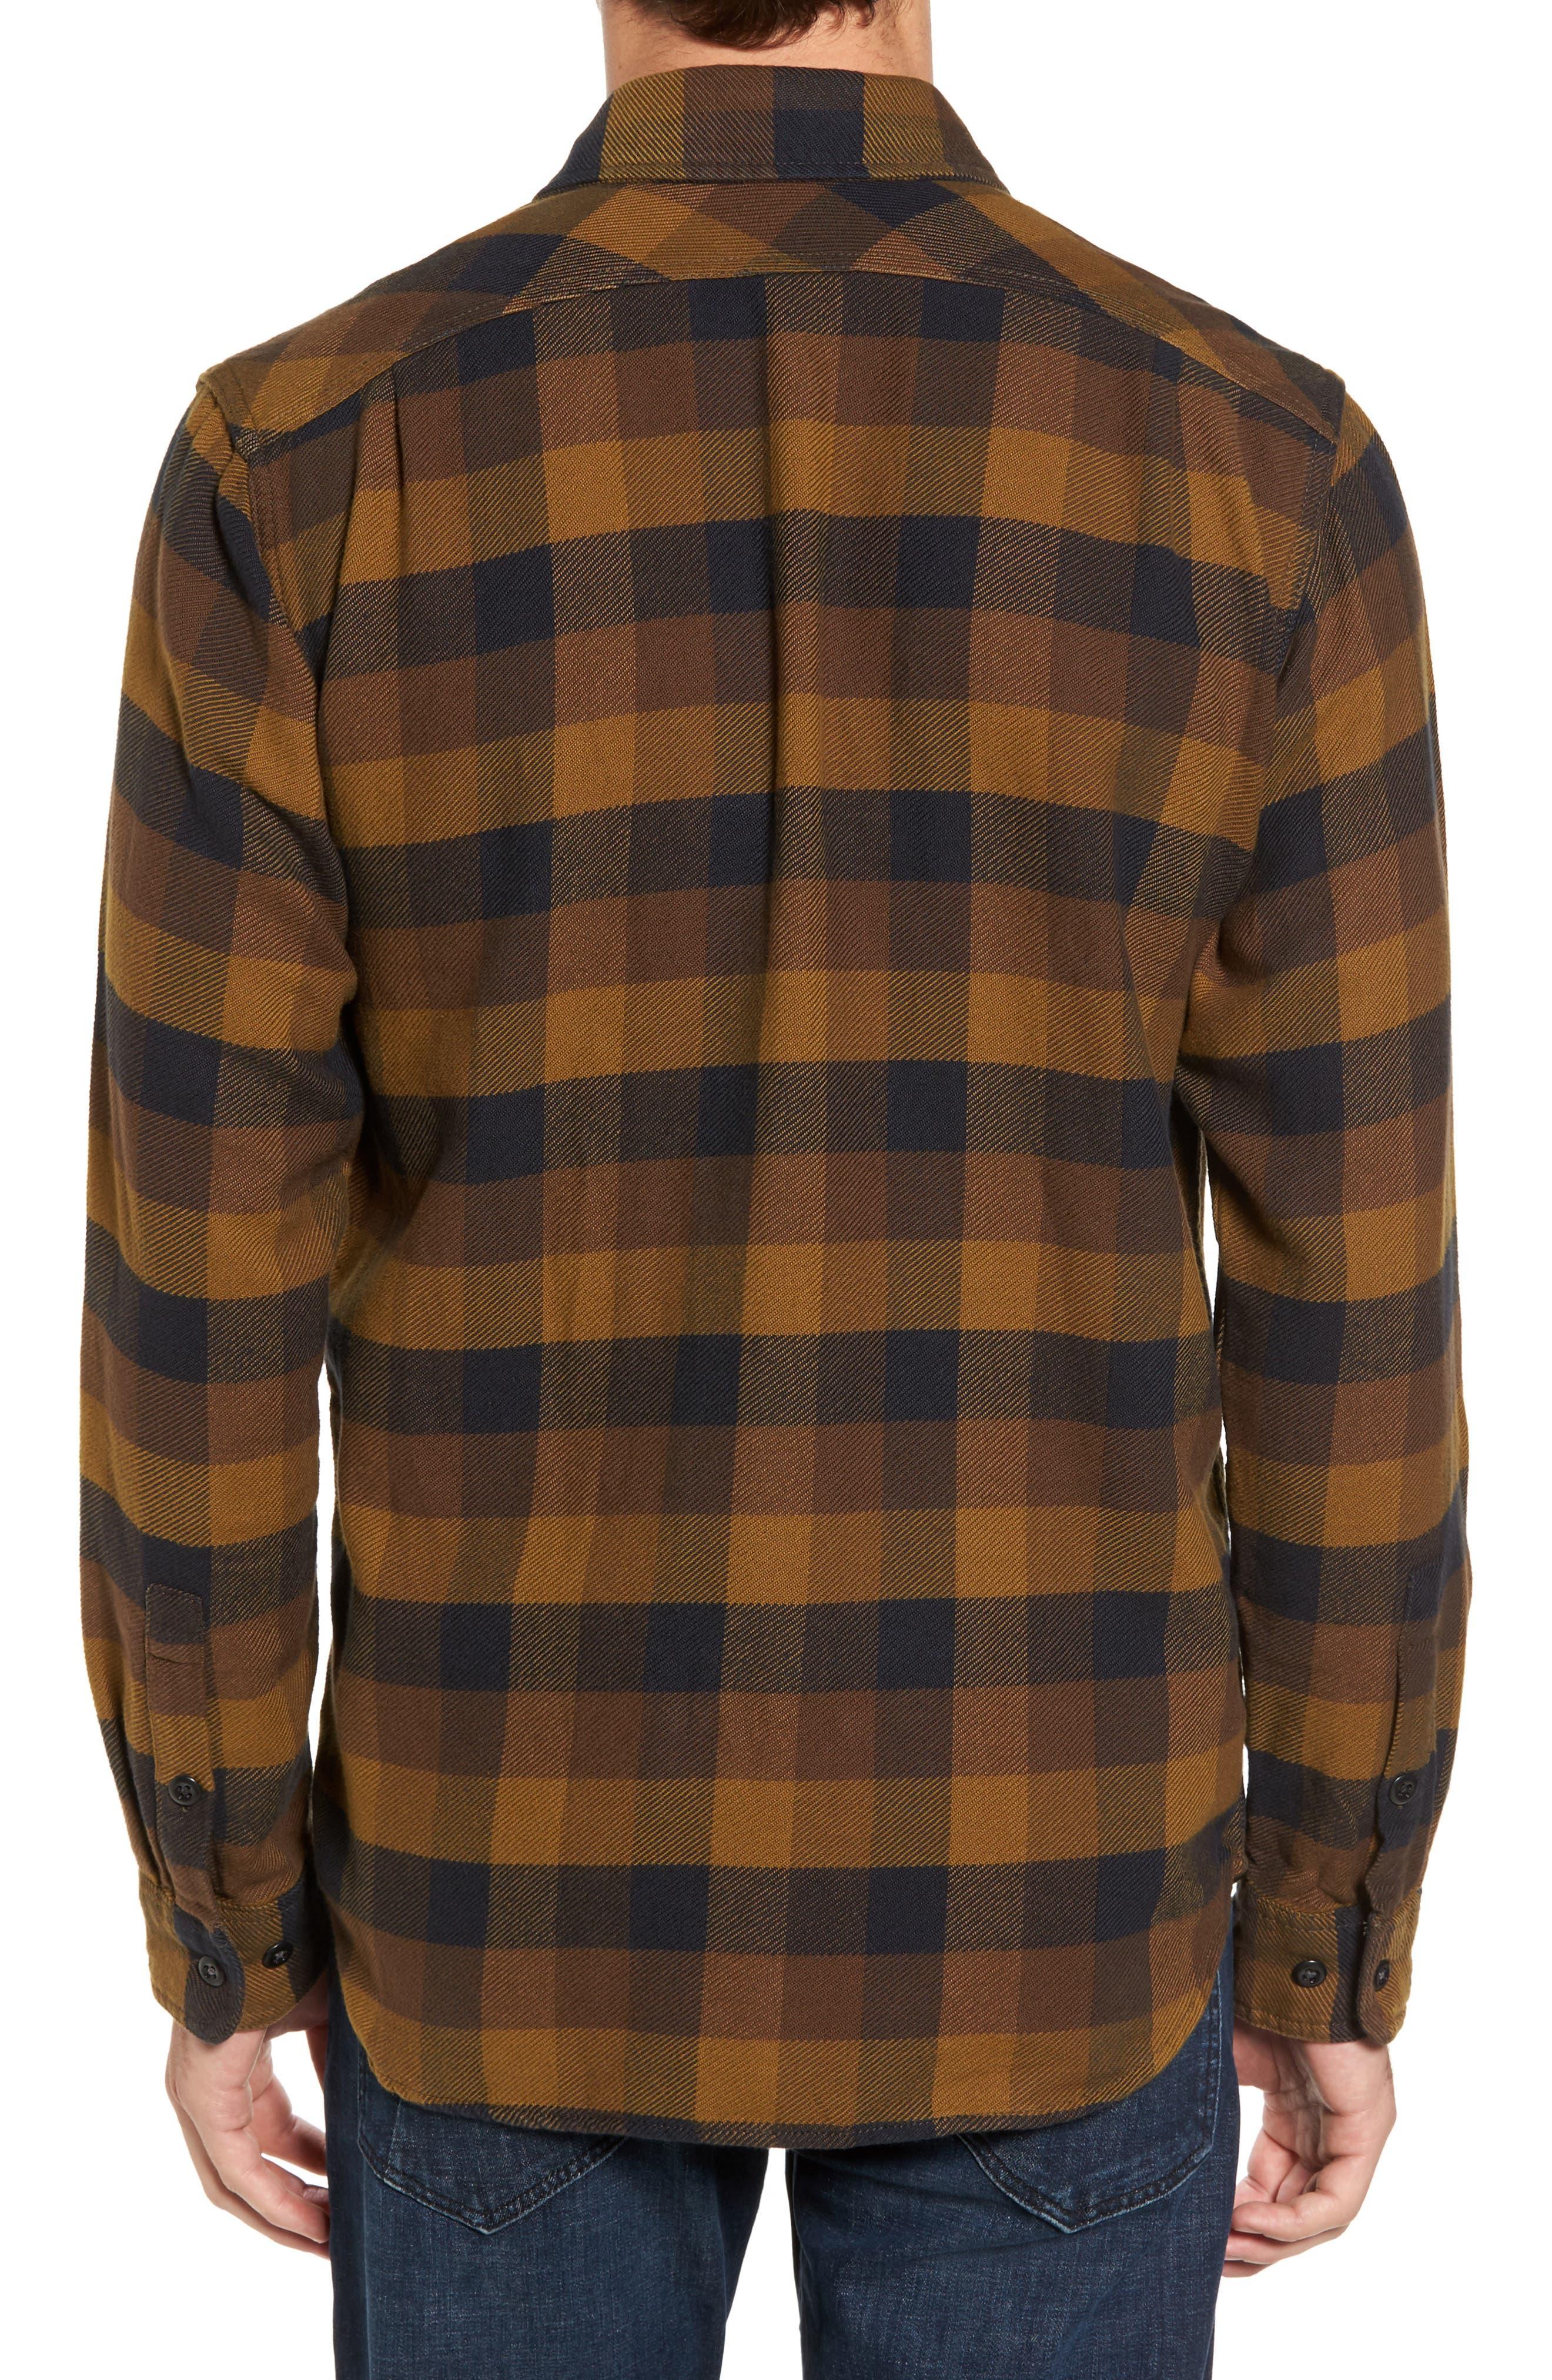 'Vintage Flannel' Regular Fit Plaid Cotton Shirt,                             Alternate thumbnail 2, color,                             Brown/ Navy